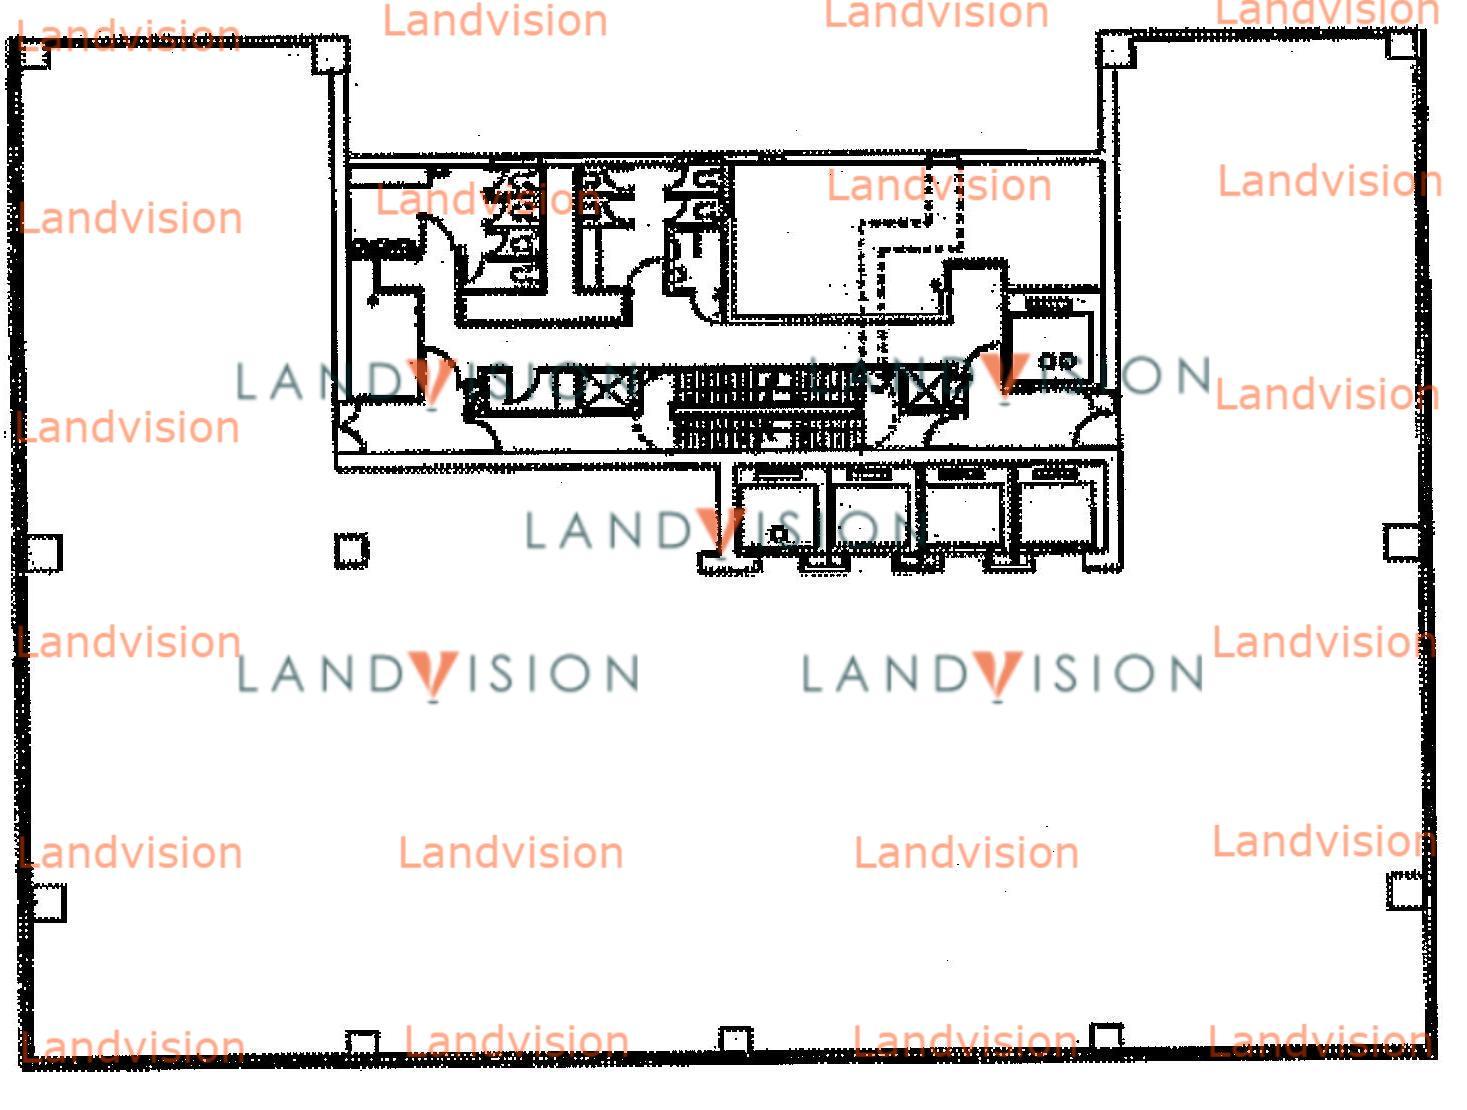 https://www.landvision.com.hk/wp-content/uploads/website/resize/floorplans/002893.JPG